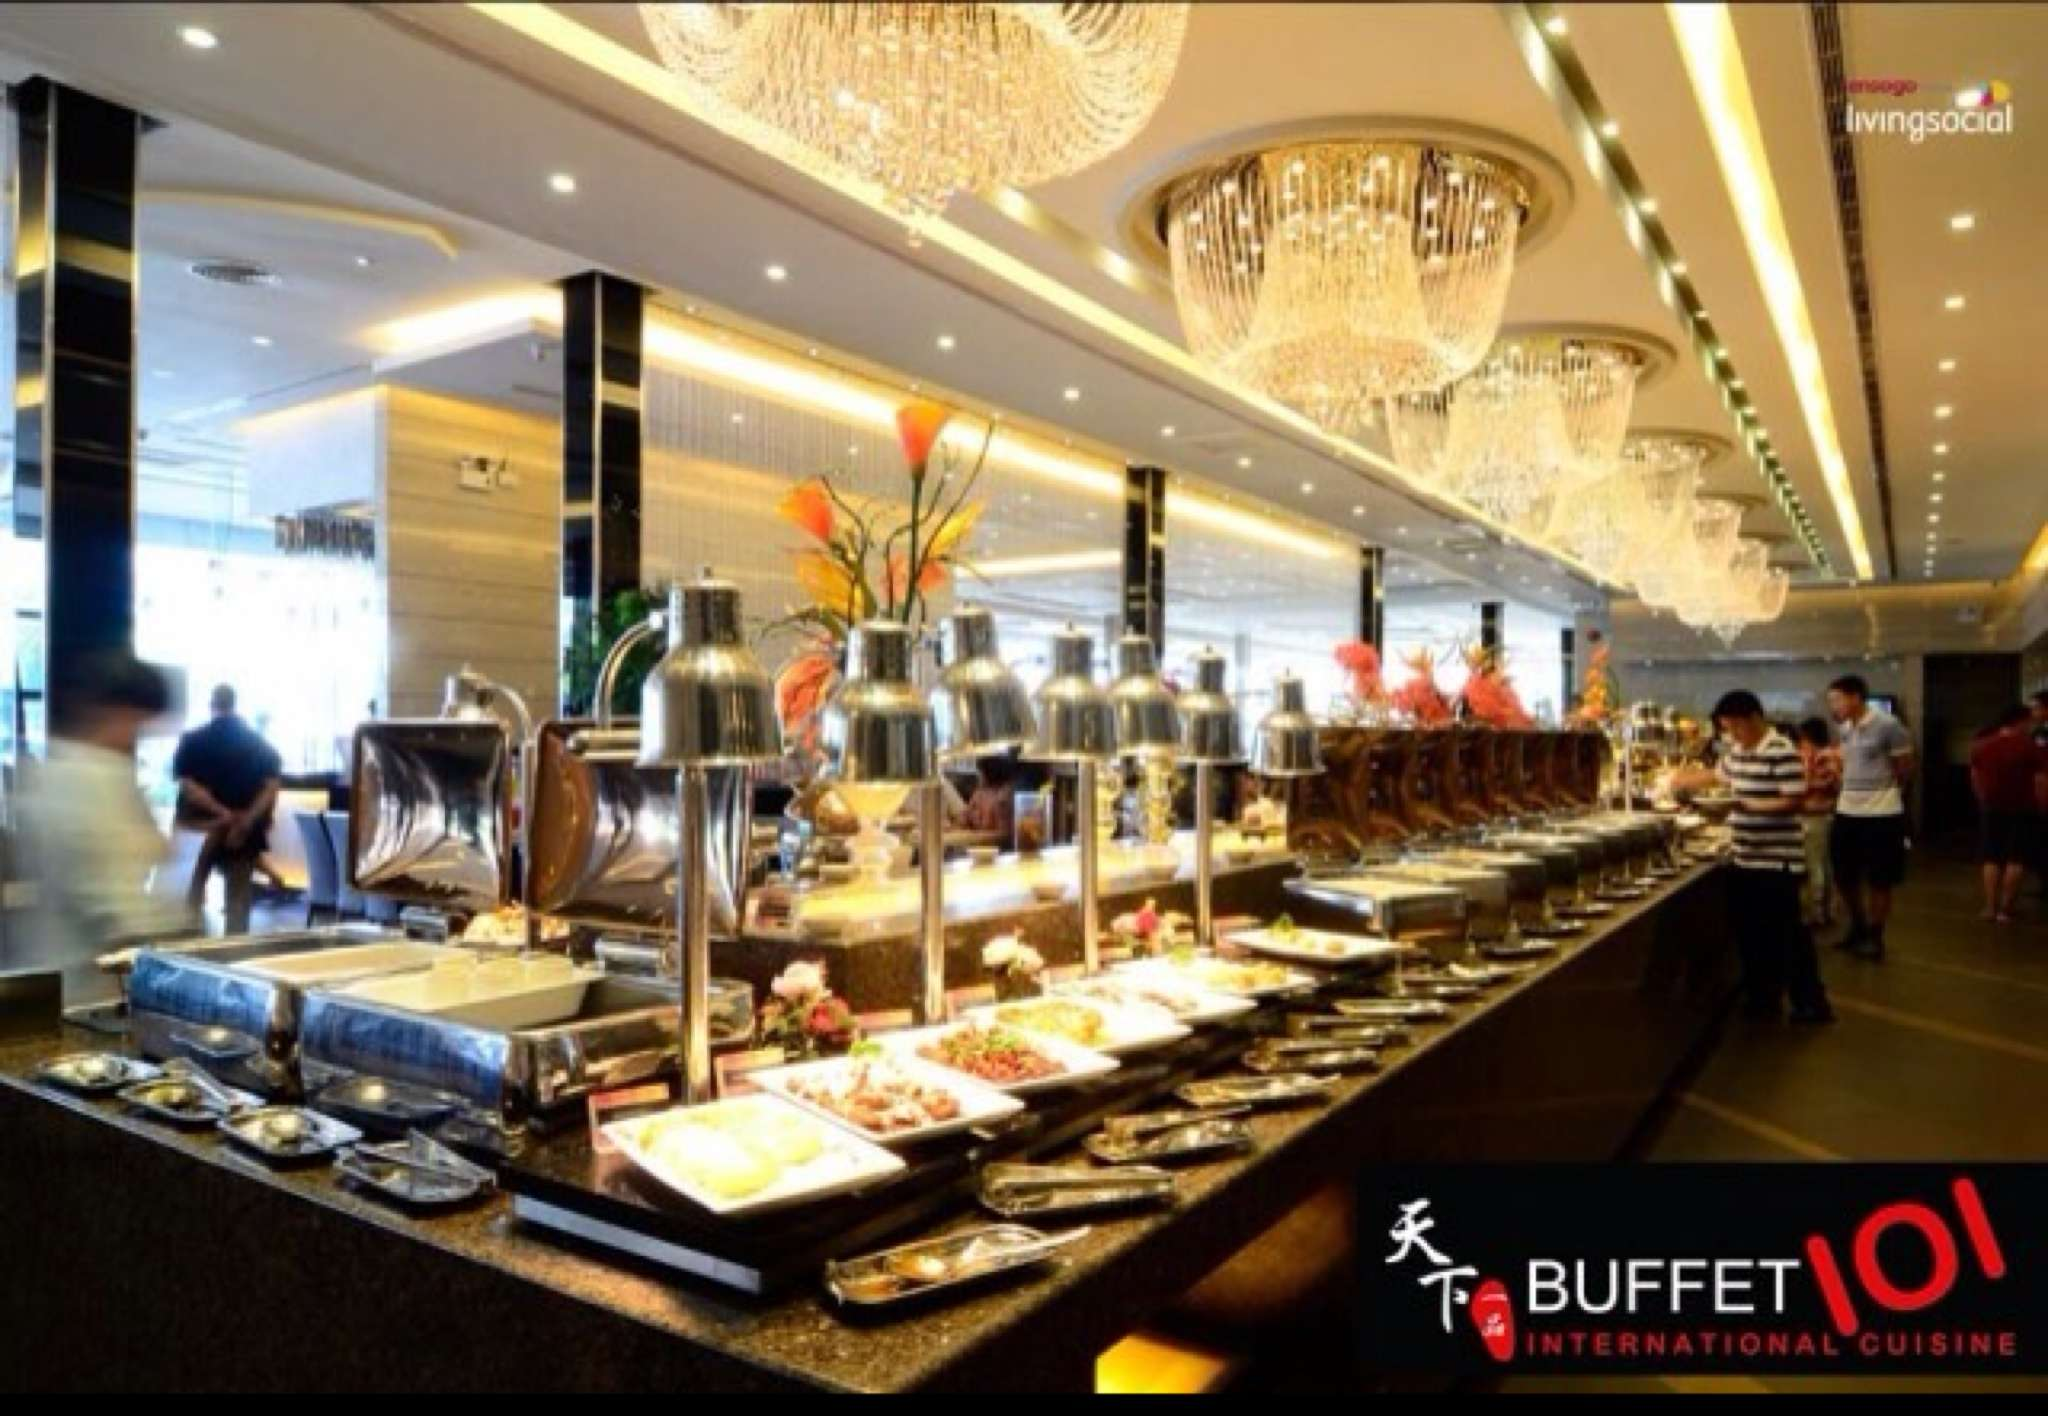 Pleasant Buffet 101 Deals Wdst Restaurant Deals Home Interior And Landscaping Oversignezvosmurscom